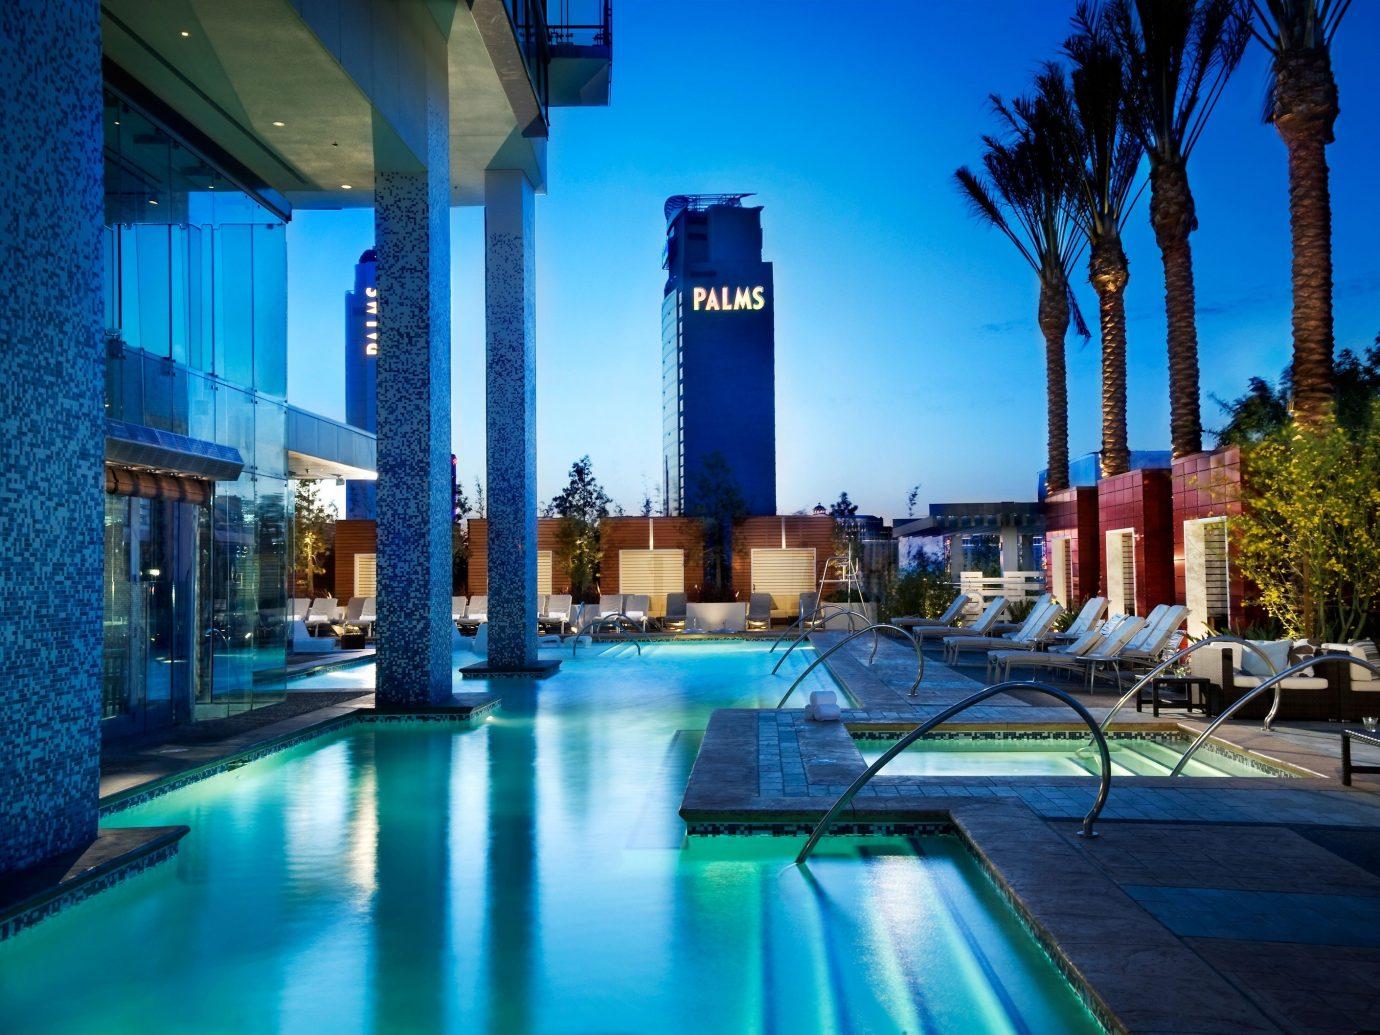 Hotels building sky outdoor swimming pool leisure Resort Pool condominium estate blue plaza